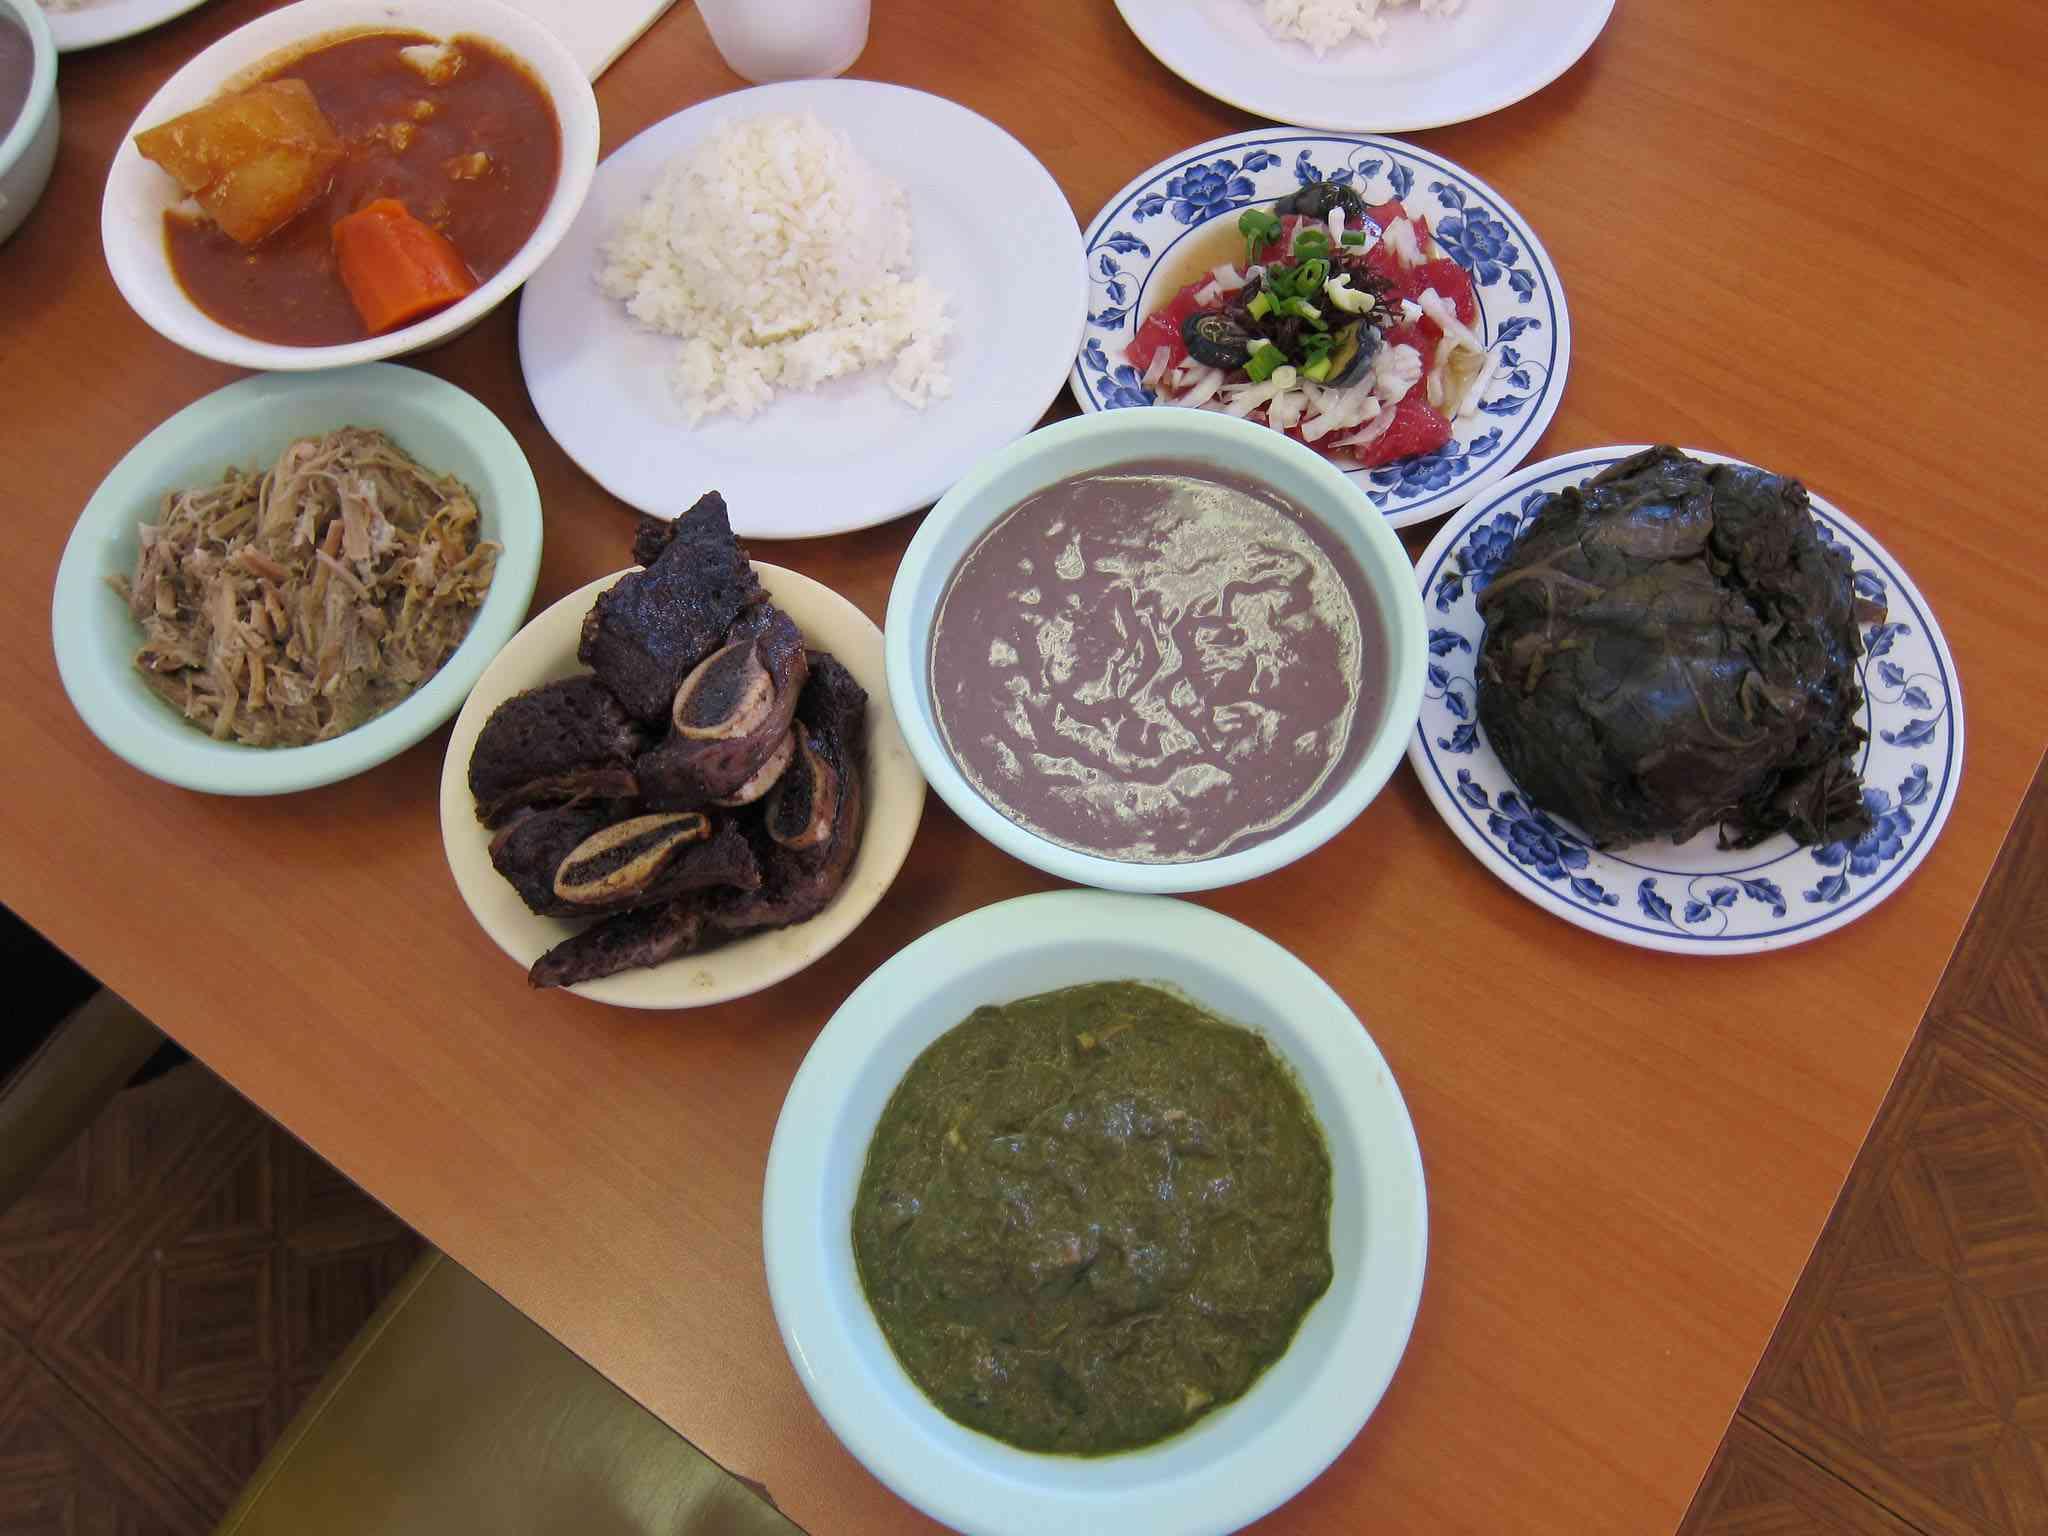 Helena's Hawaiian Food—From top left, counter clockwise—Tripe Stew, Rice, Opihi Poke, Laulau, Squid Luau, Pipikaula Shortribs, Kalua Pig and Poi in the center